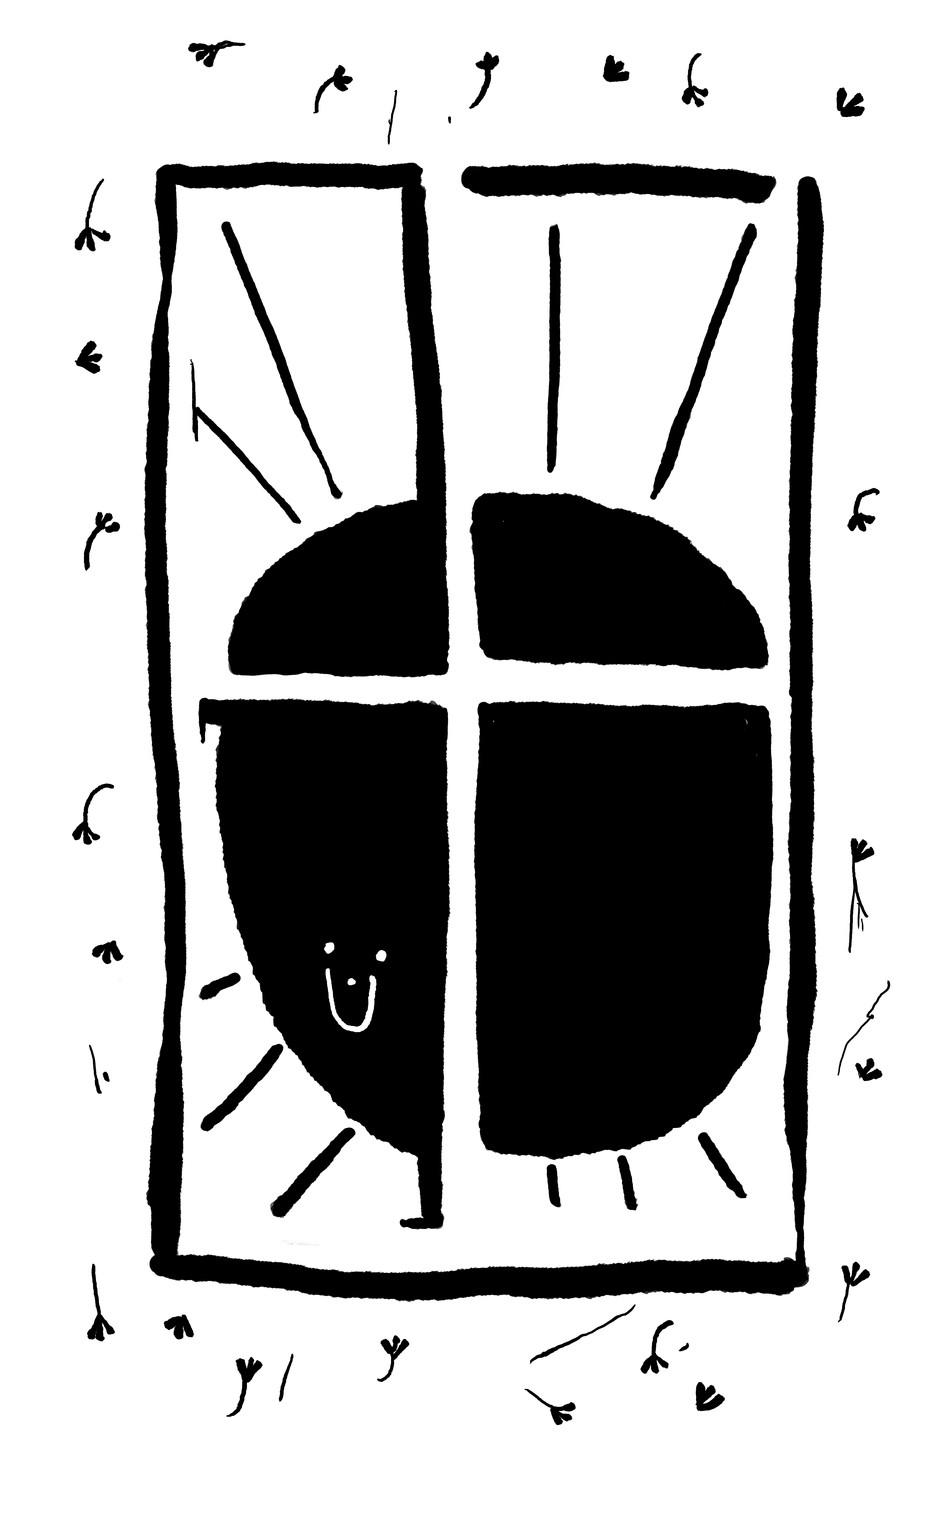 Illustration - Illustration for A Book of Sonnets by Jake Faulkner